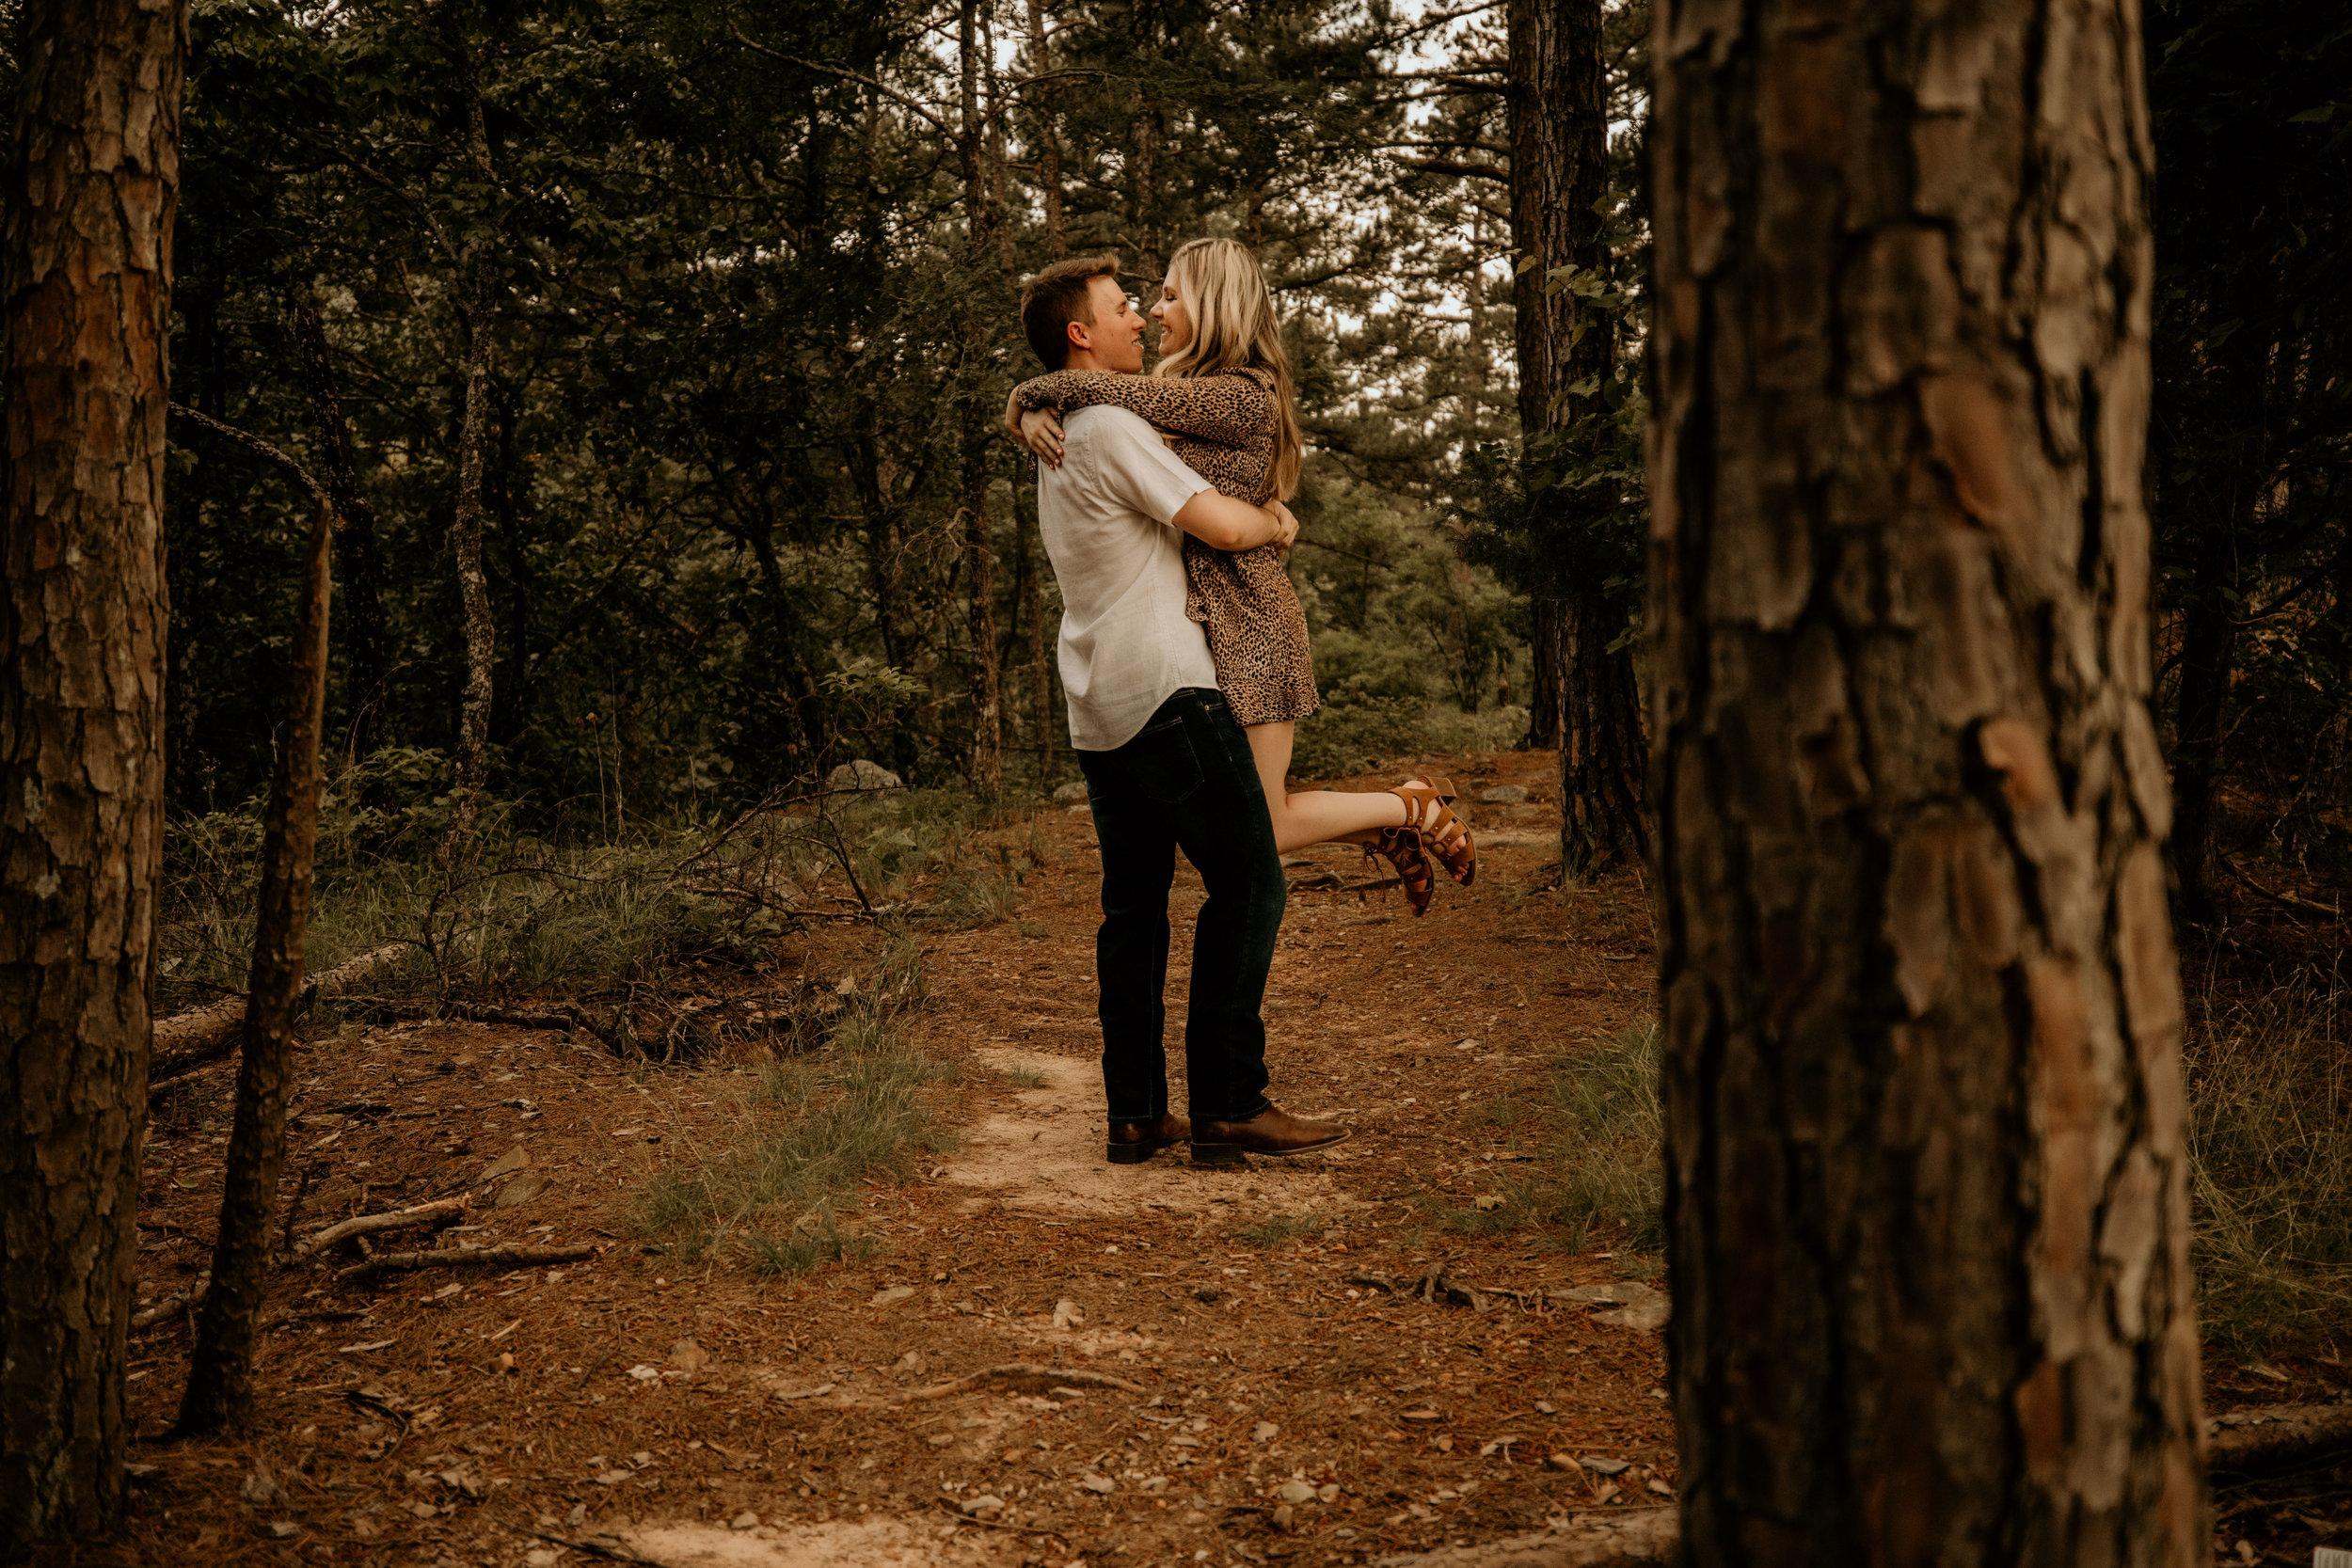 pinnacle-mountain-wedding-elopement-little-rock-arkansas-photographer-erin-venable-photography-bride-engagement-6940.jpg